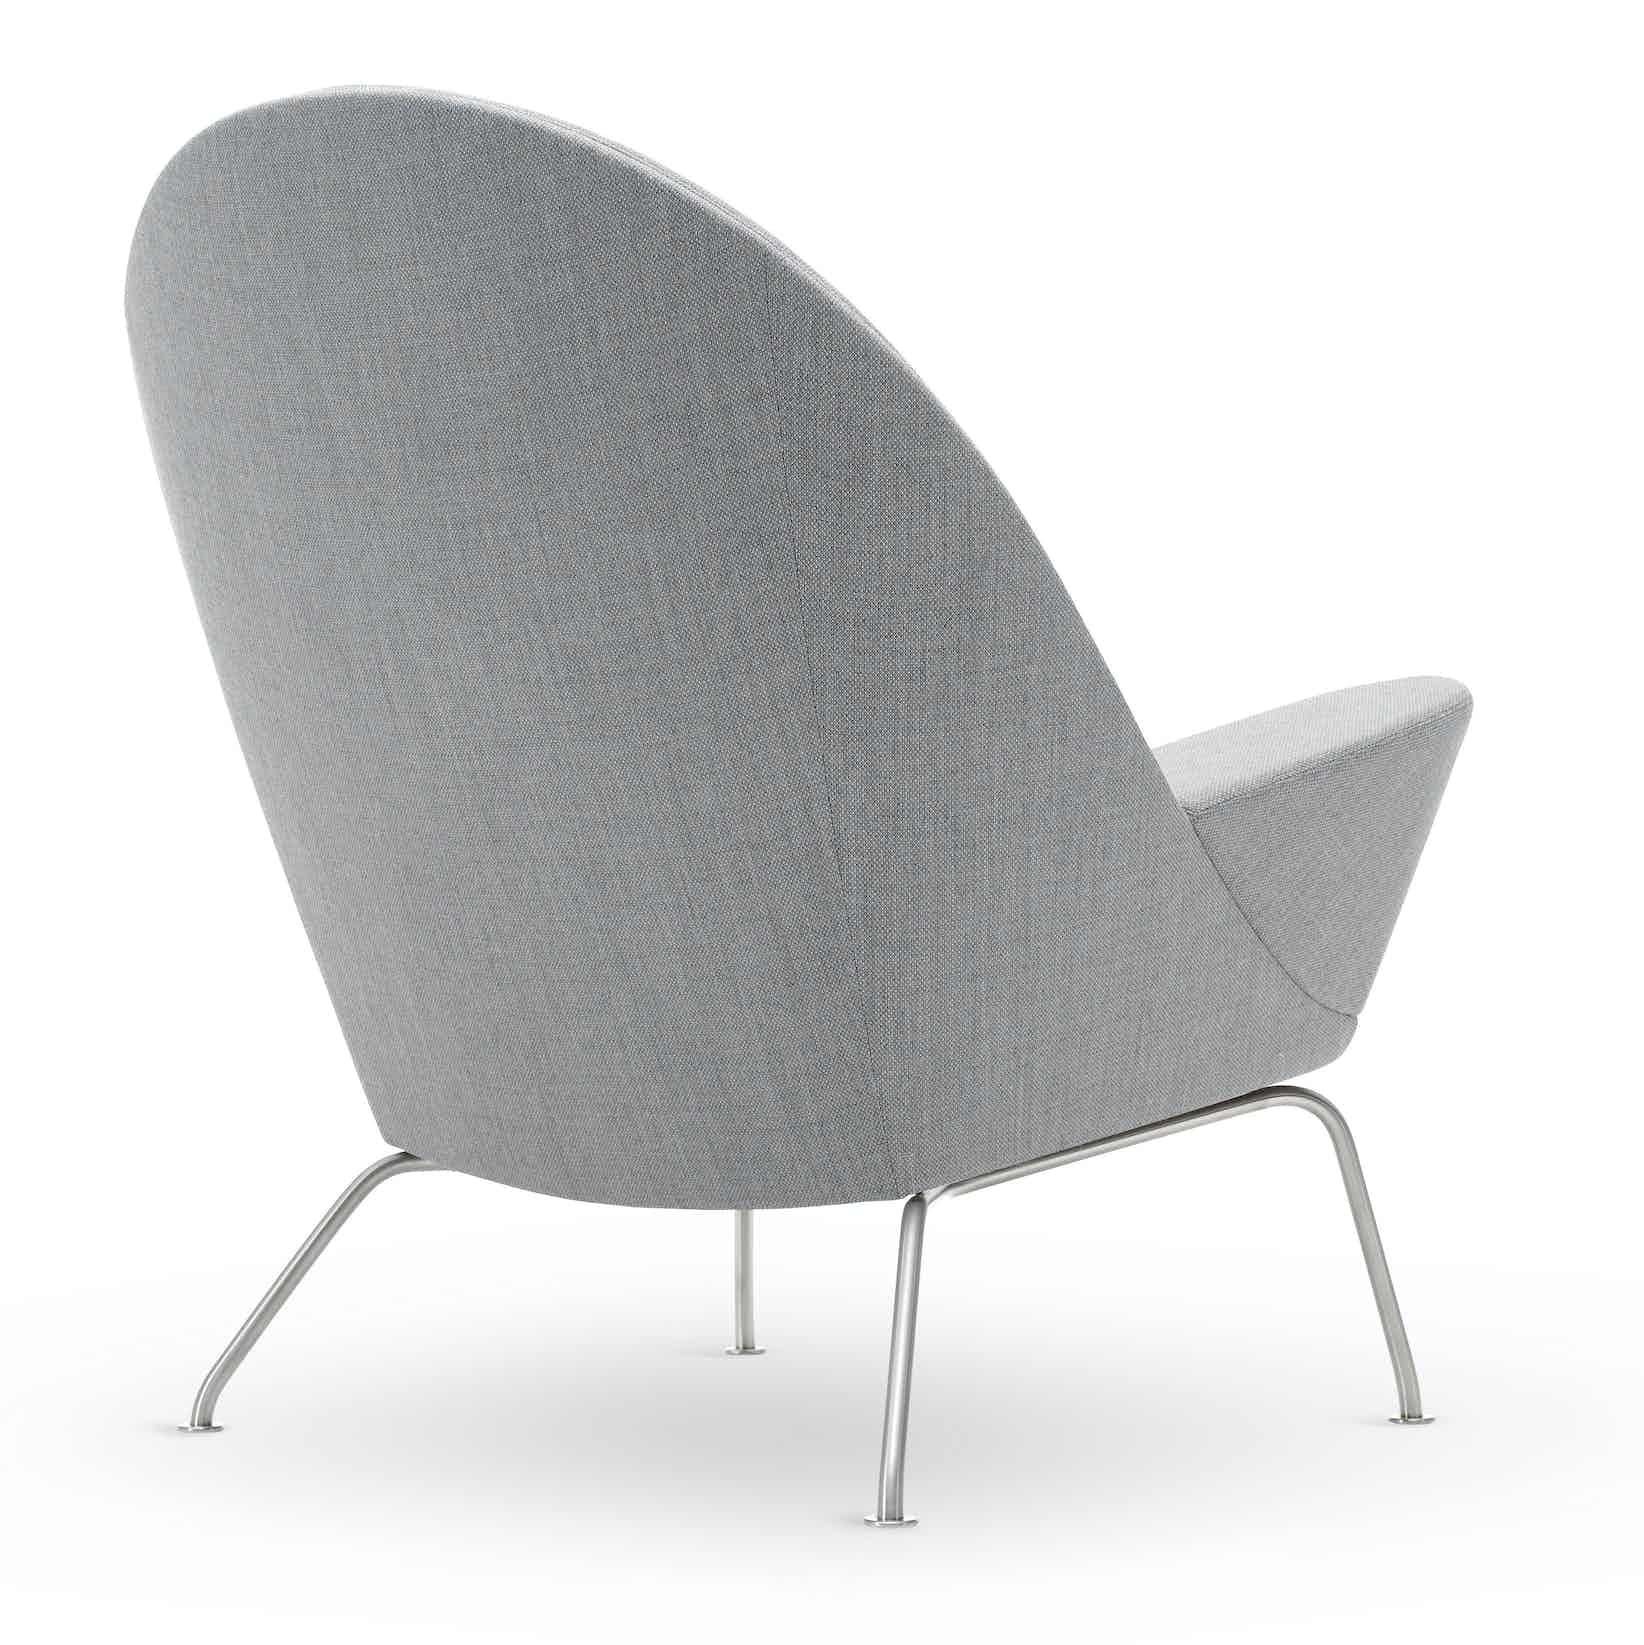 Carl-hansen-son-back-grey-ch468-haute-living